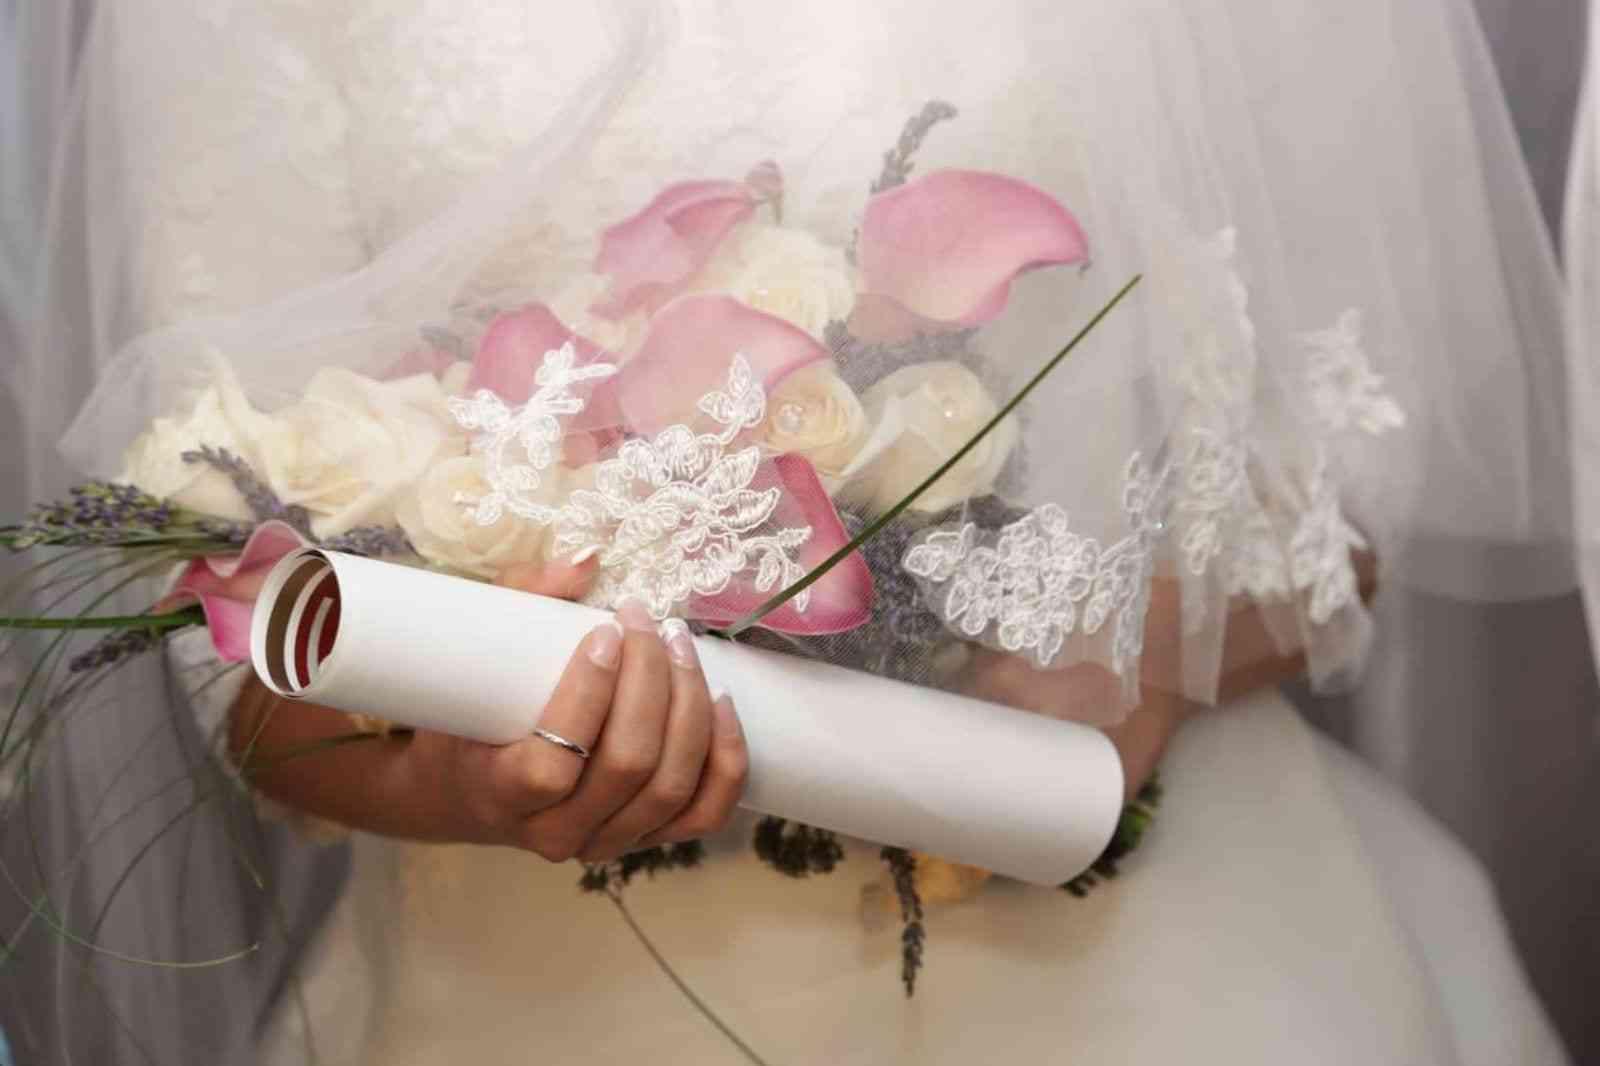 Romantic Jewish Wedding Ideas to Celebrate the Big Day